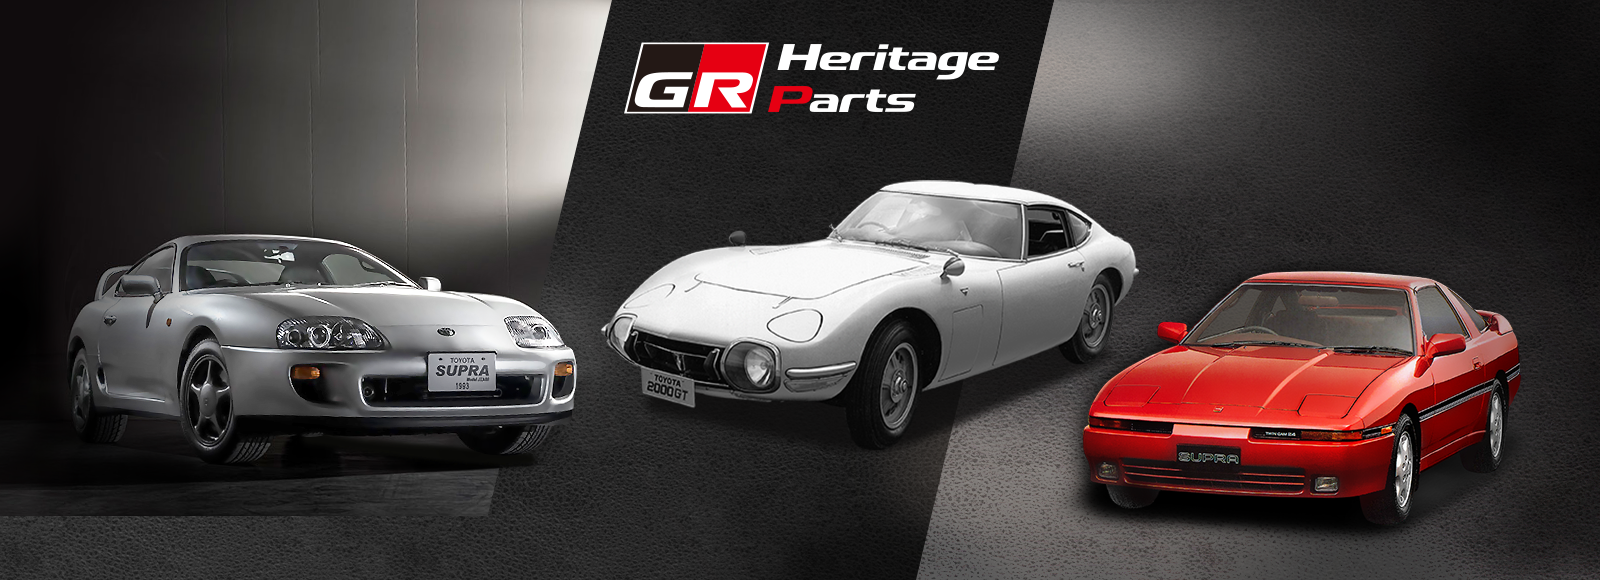 Toyota GR Heritage Parts banner image